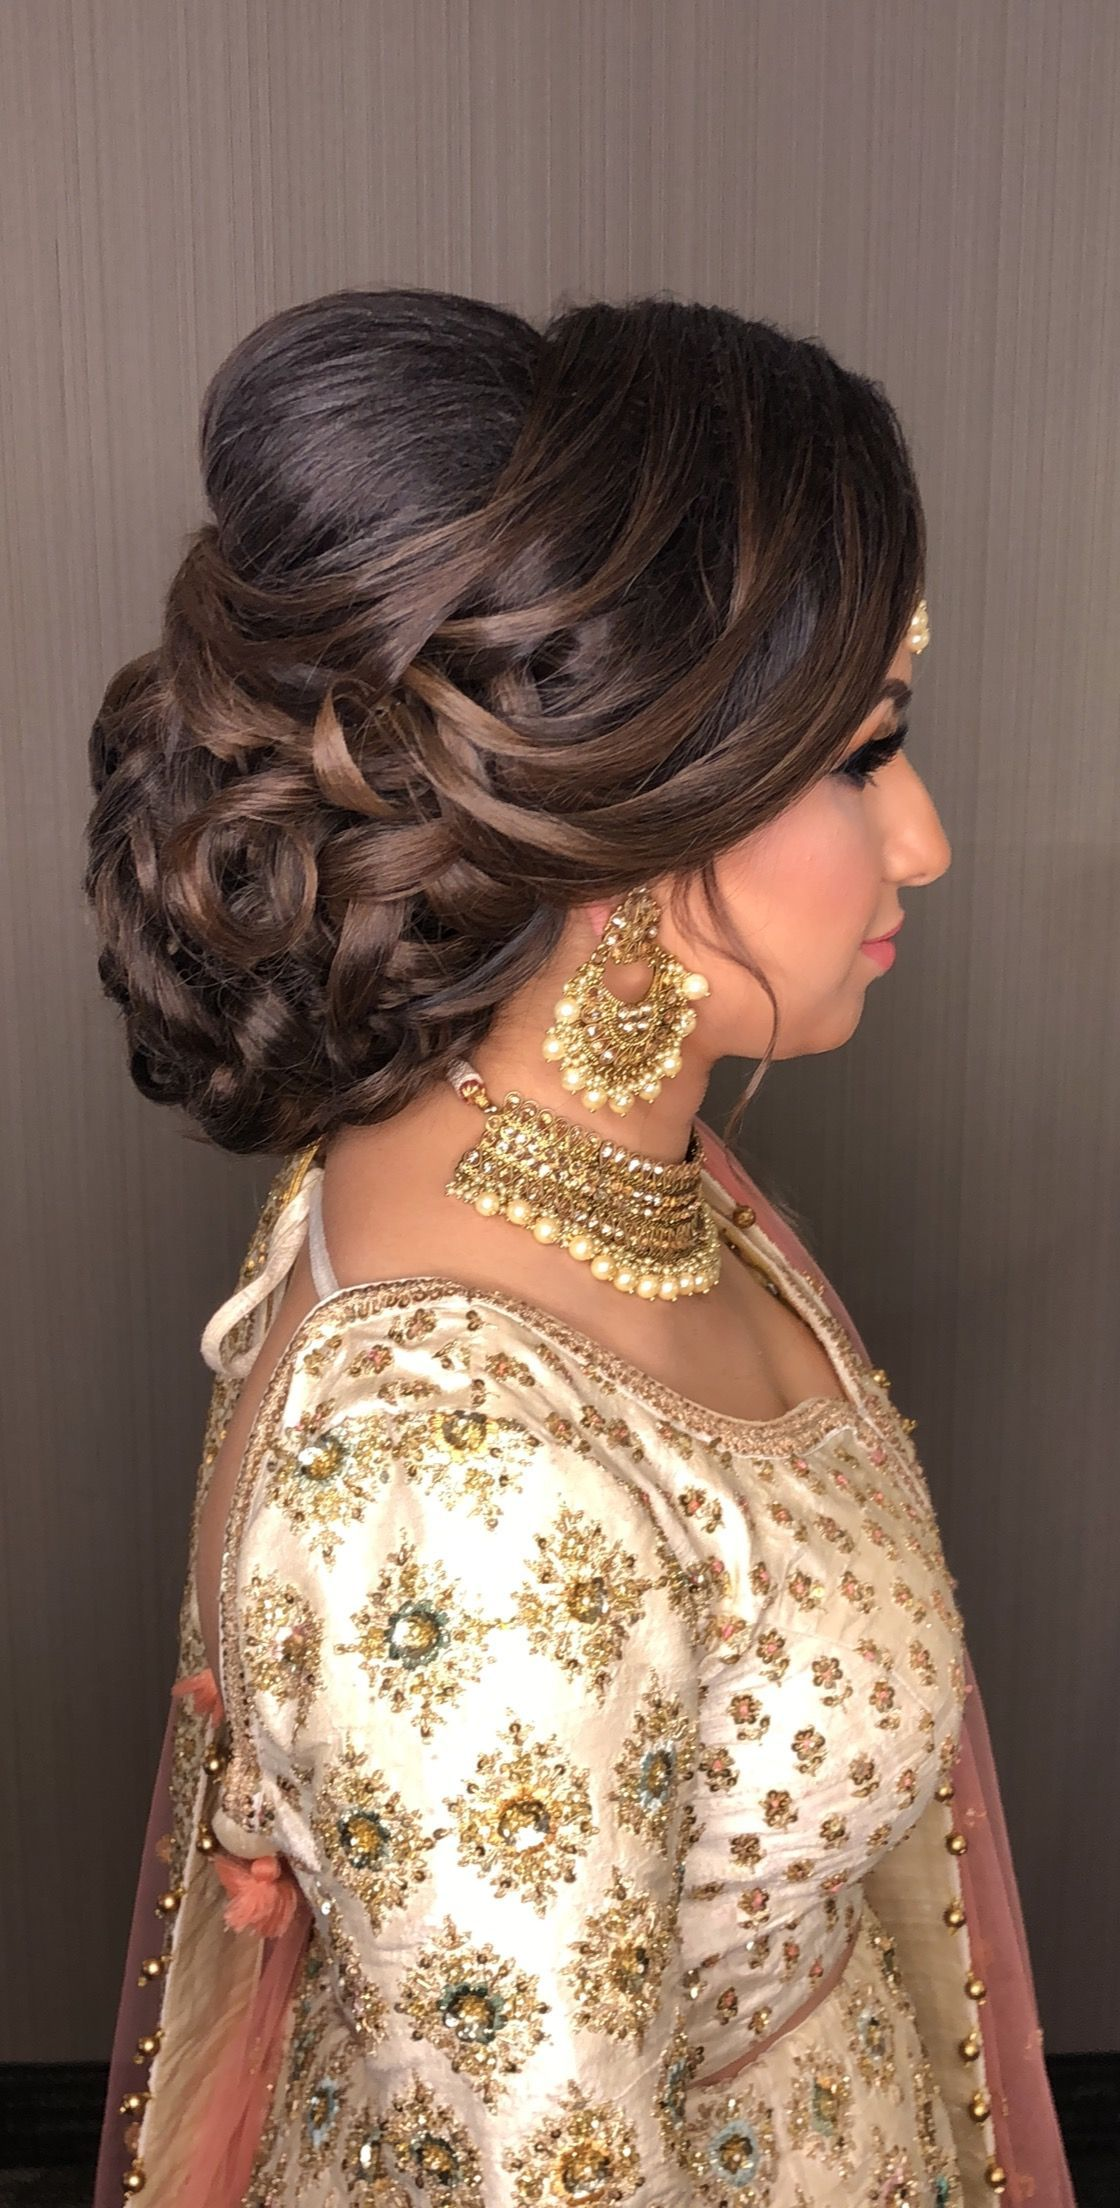 Illustrious Indianweddinghairstylesaishwaryarai Hairdo Wedding Indian Wedding Hairstyles South Indian Wedding Hairstyles